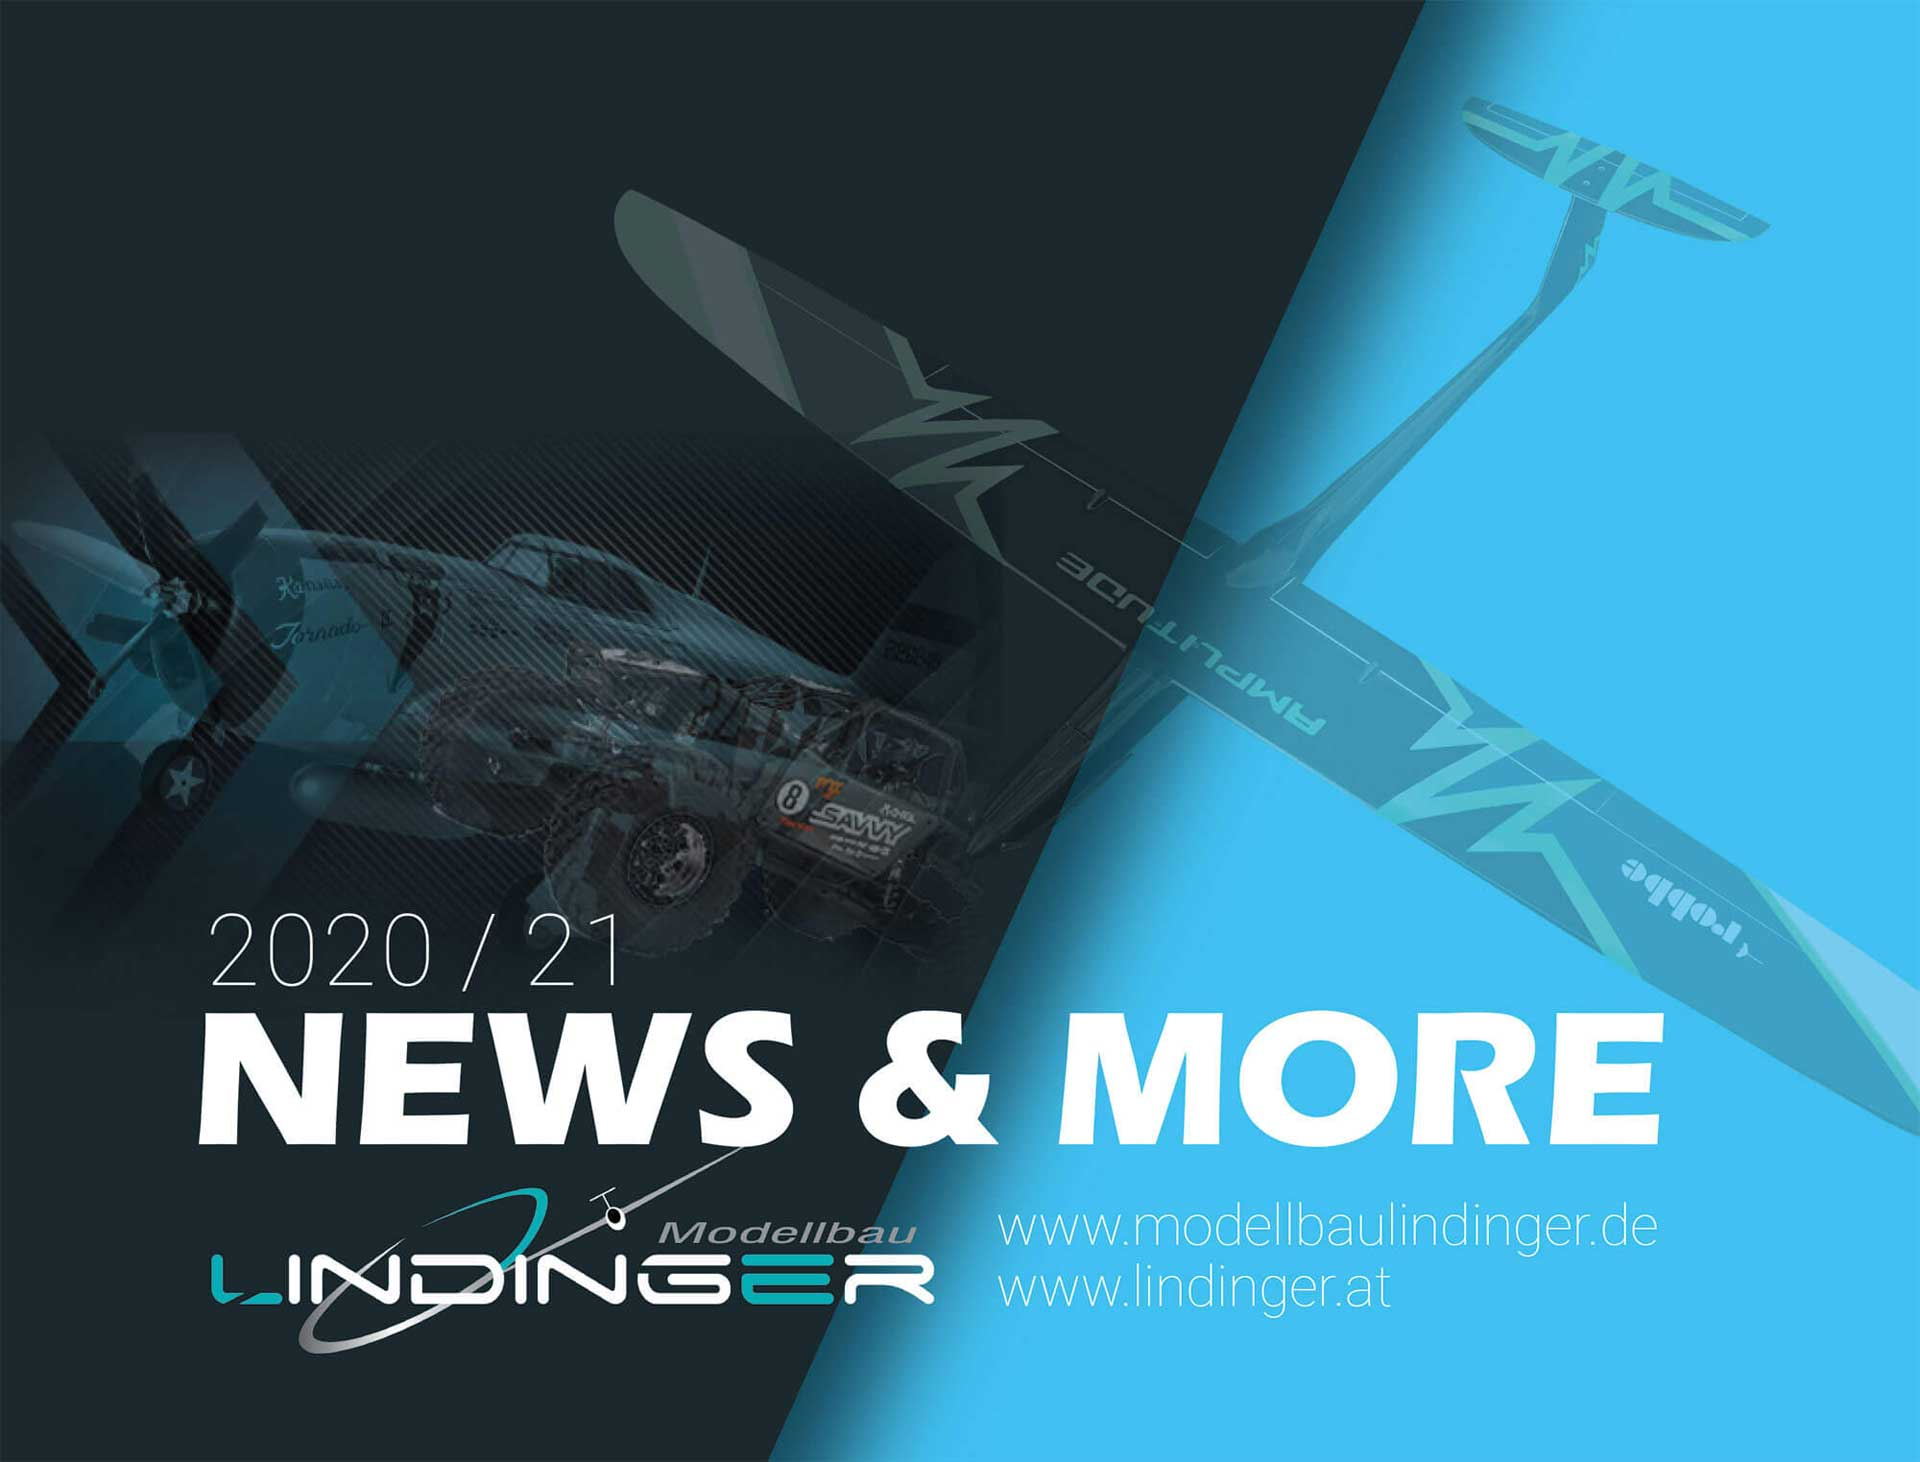 News & More 2020/21 Modellbau Lindinger